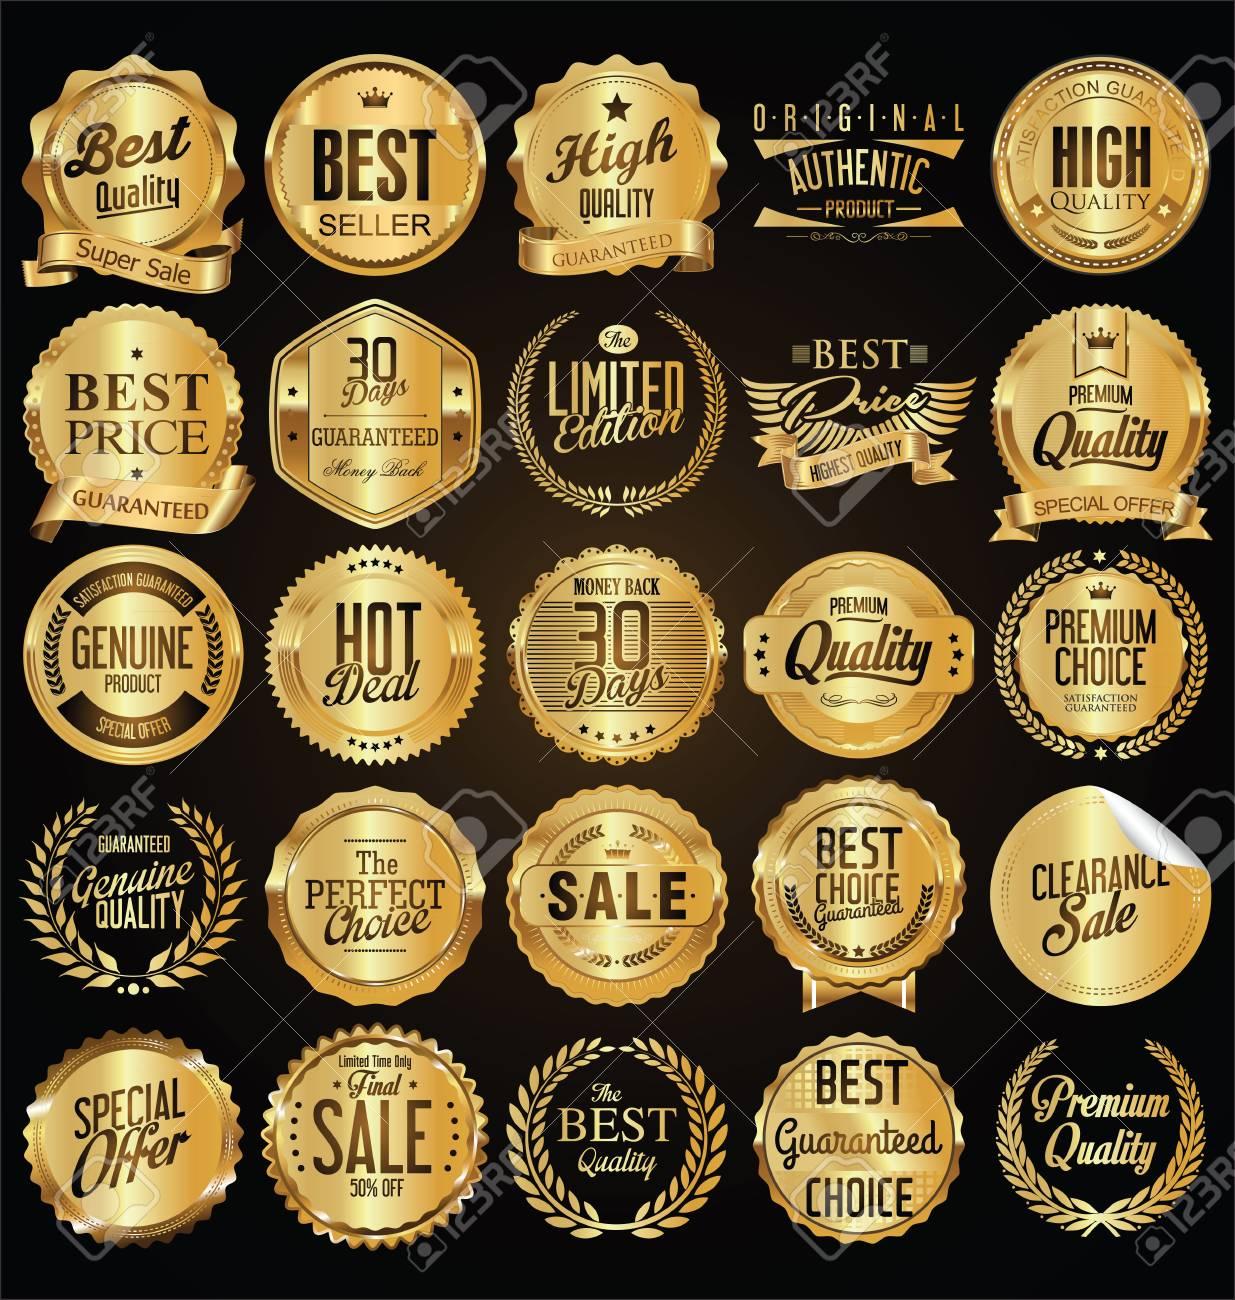 Retro vintage golden badges vector illustration collection - 93020569